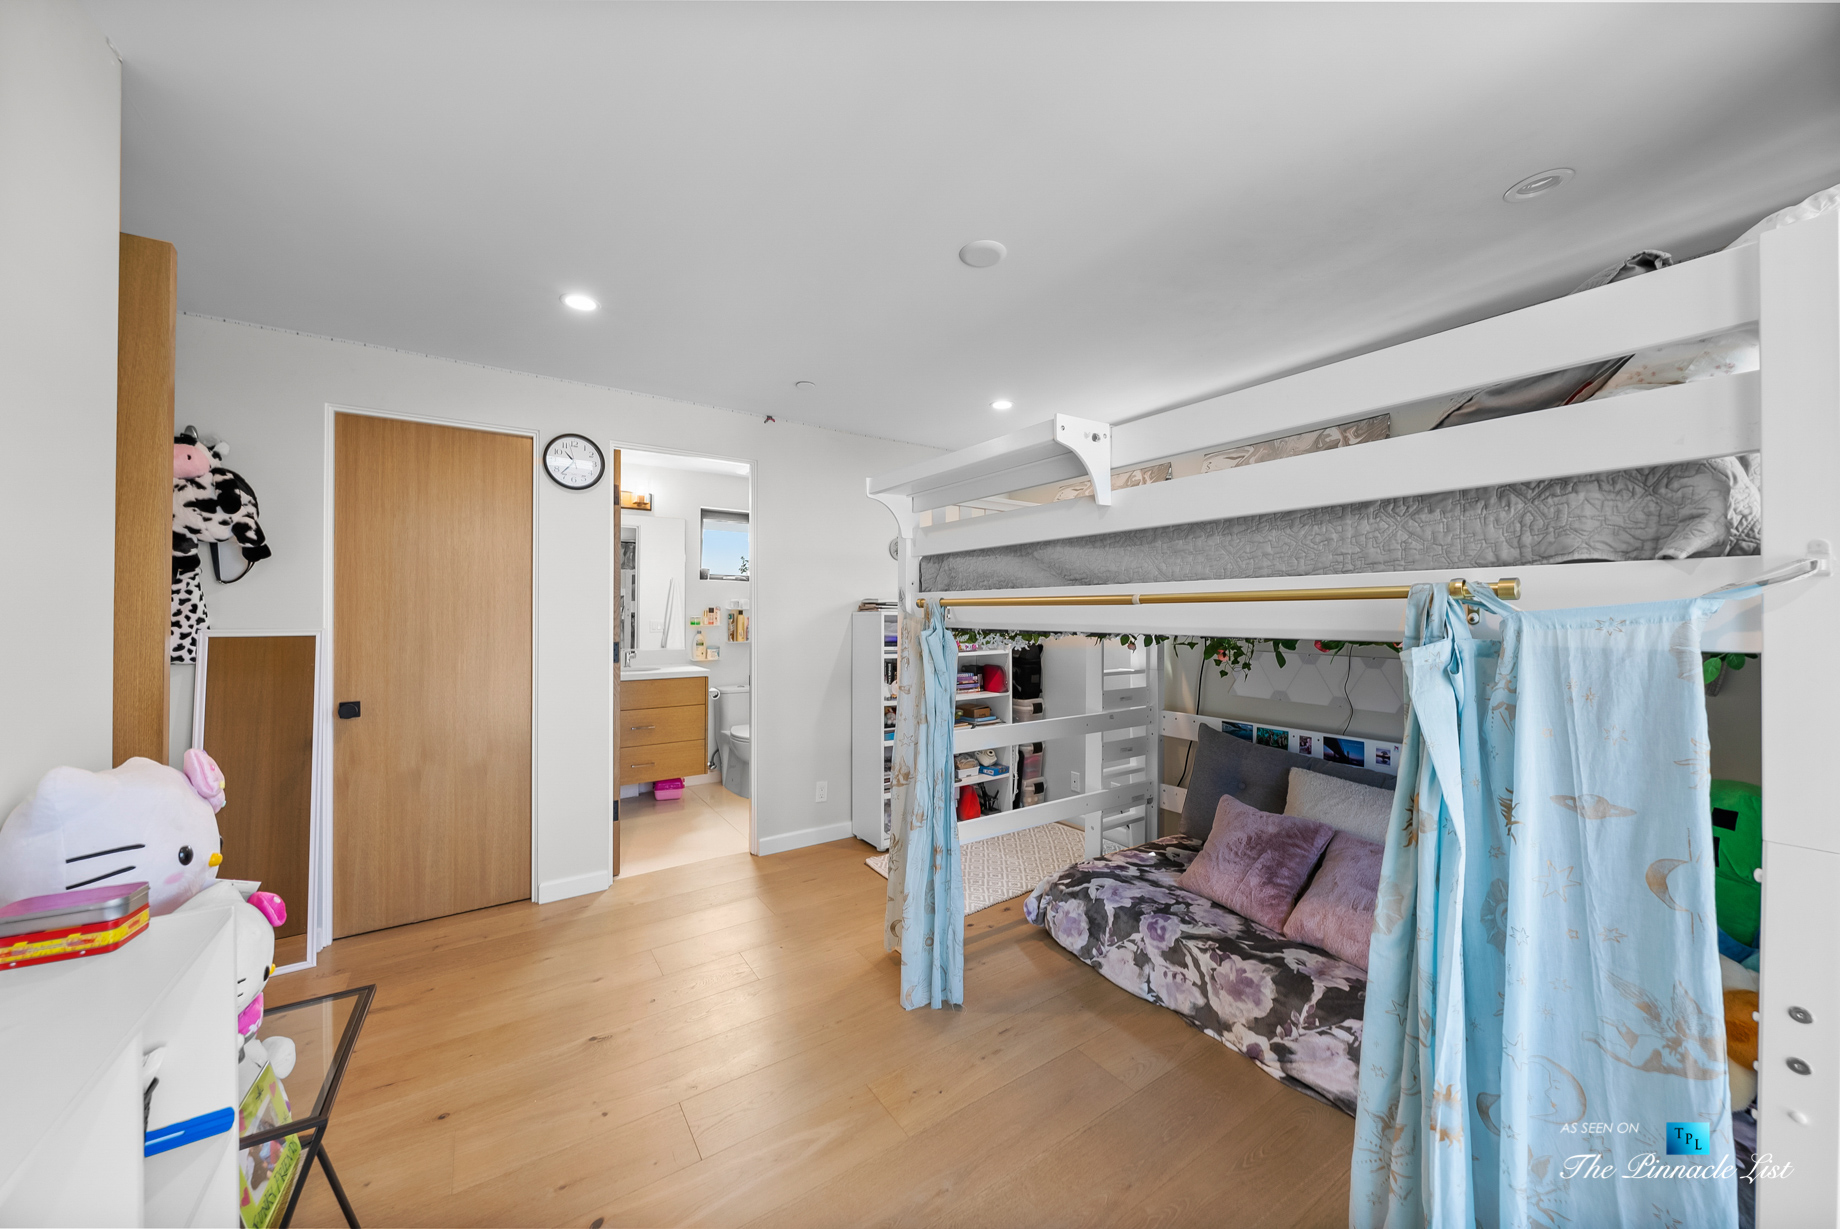 246 30th Street, Hermosa Beach, CA, USA – Bedroom